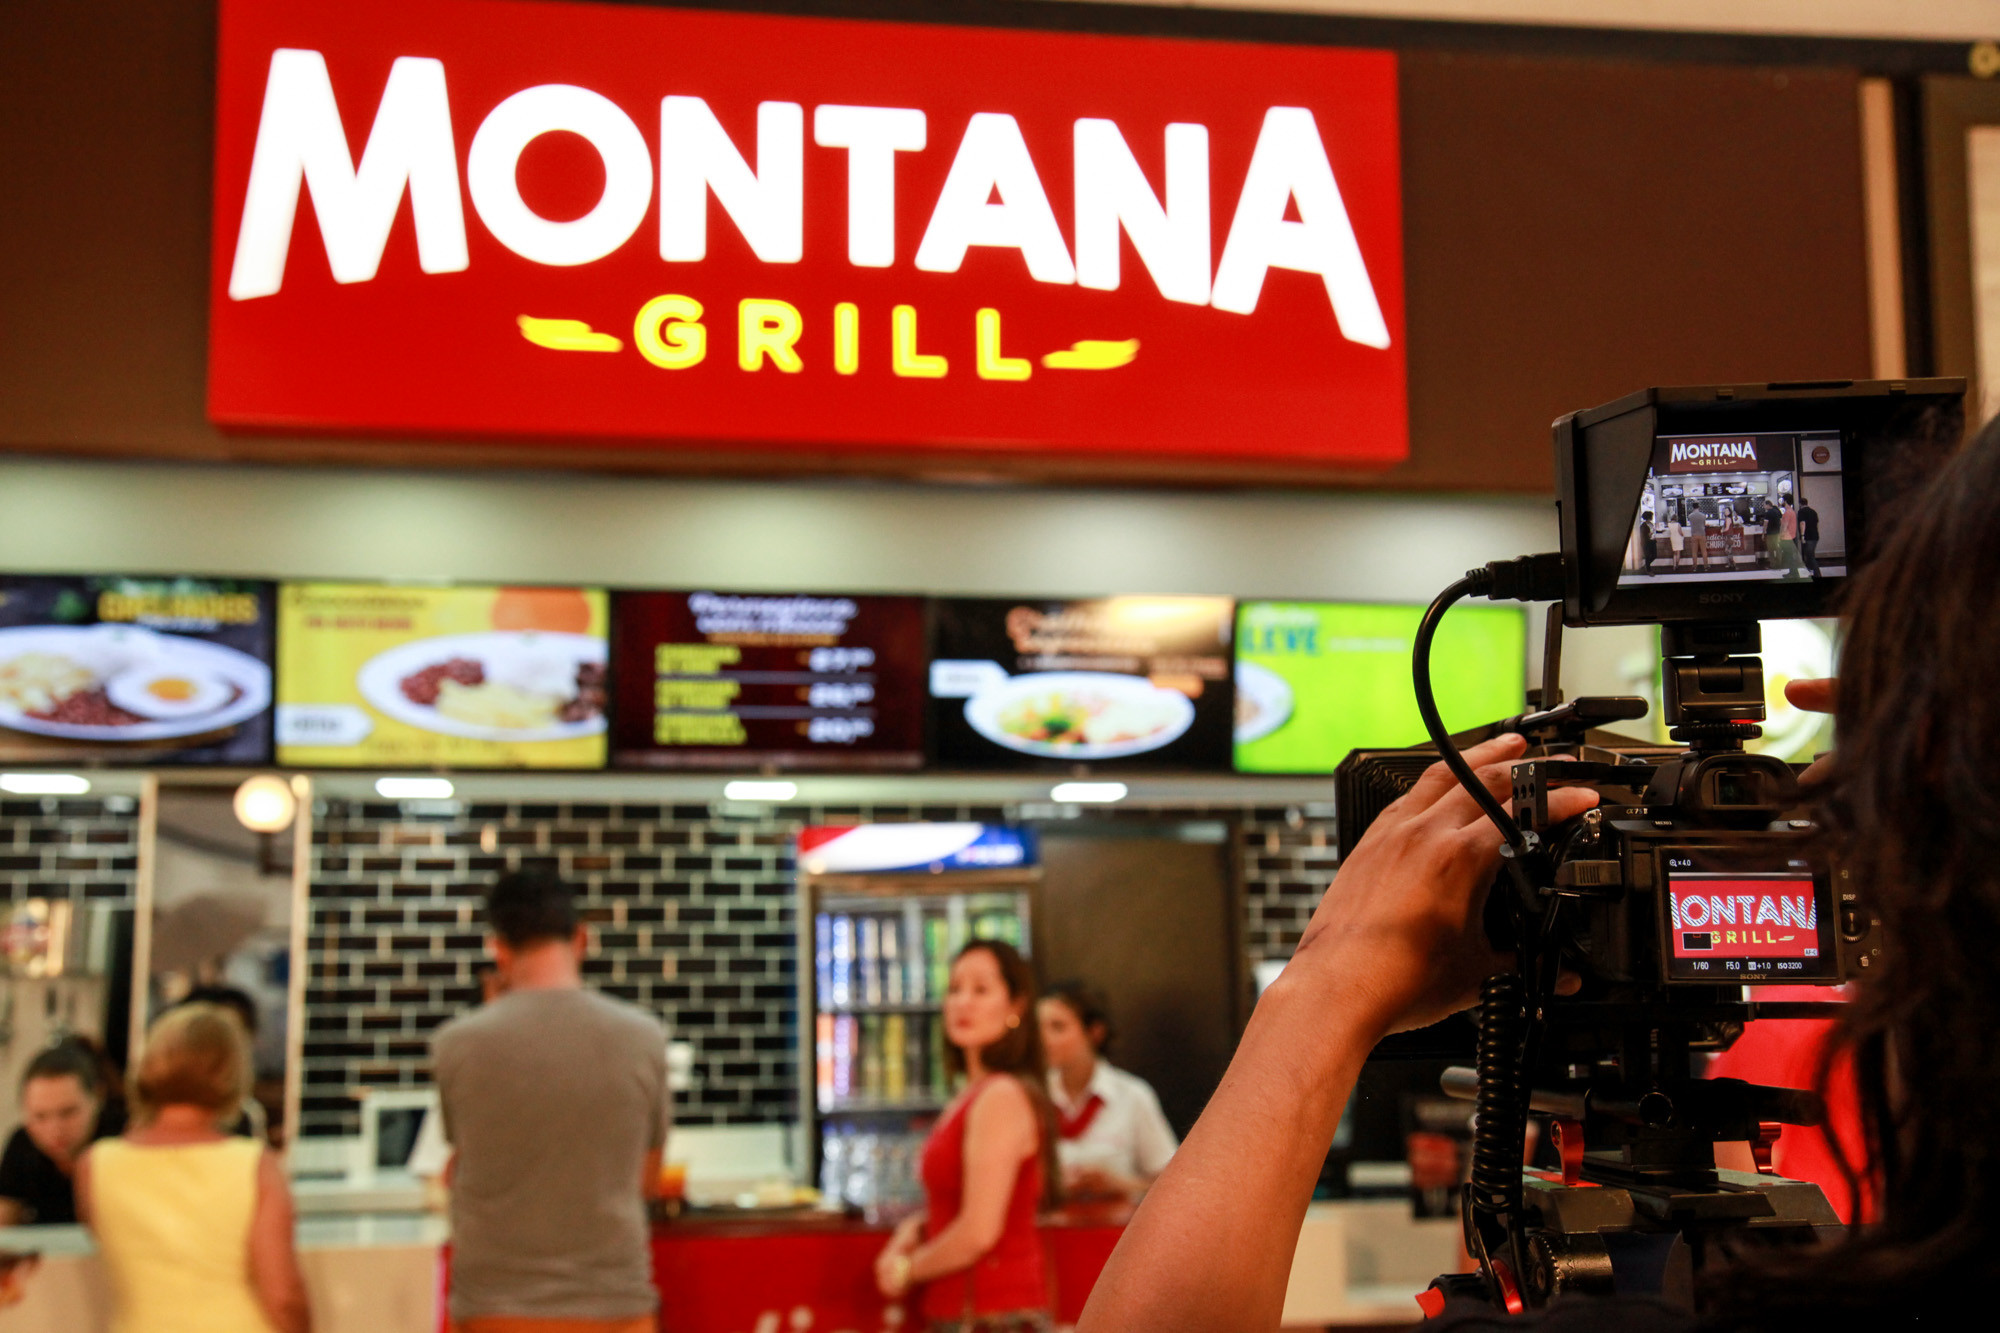 Montana Grill patrocina novo programa de Felipe Bronze no GNT